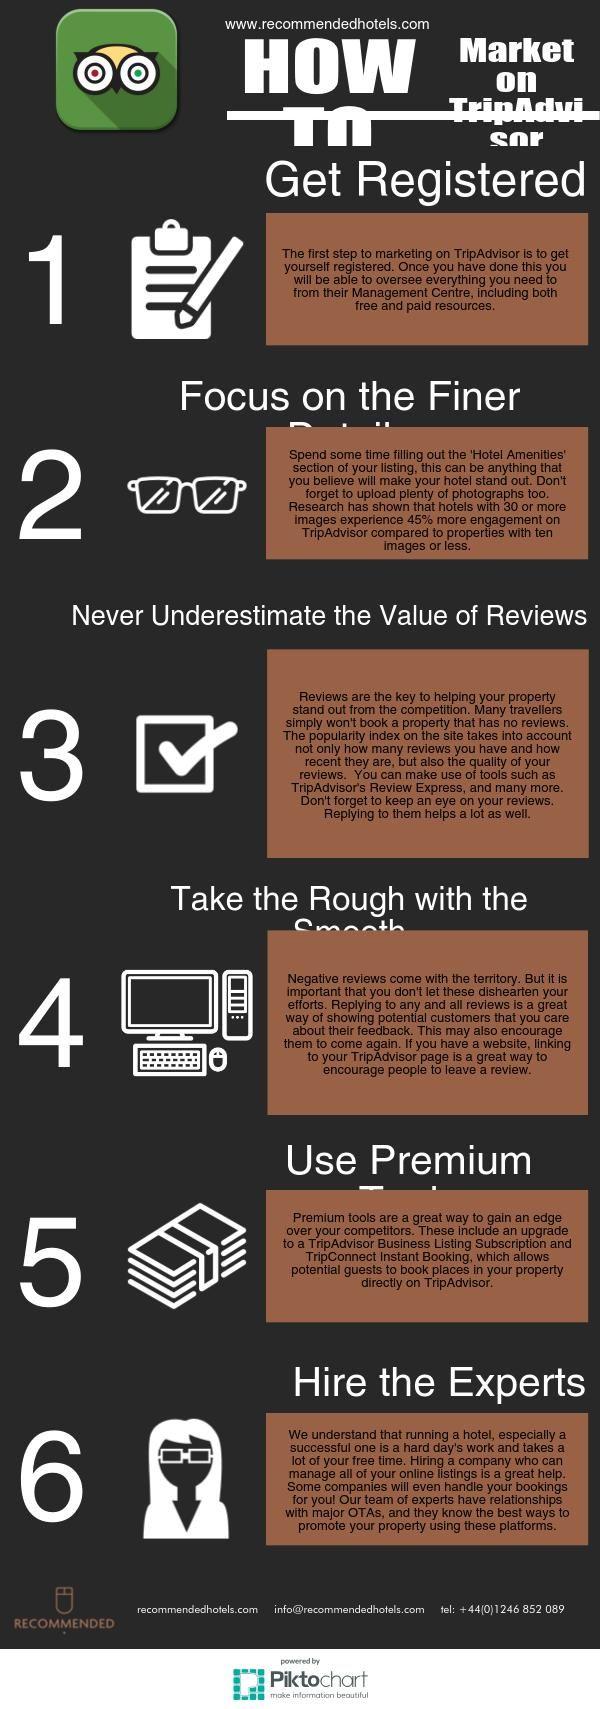 Learn how to market on TripAdvisor here... #TripAdvisor #HotelMarketing #Hotels #OTAs #Infographic